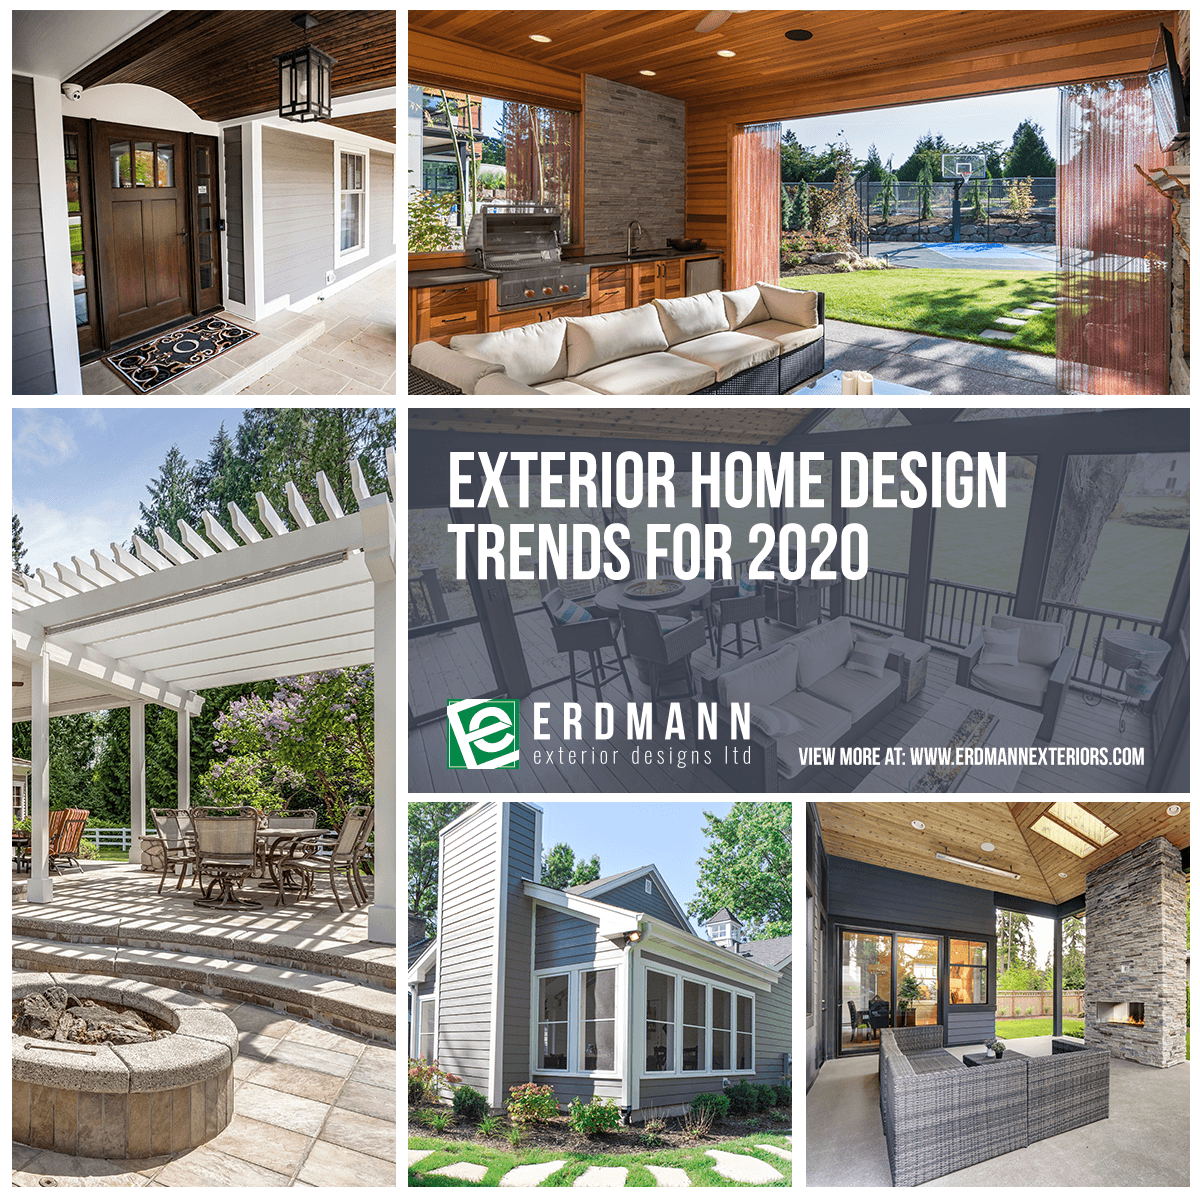 Exterior Home Design Trends for 2020